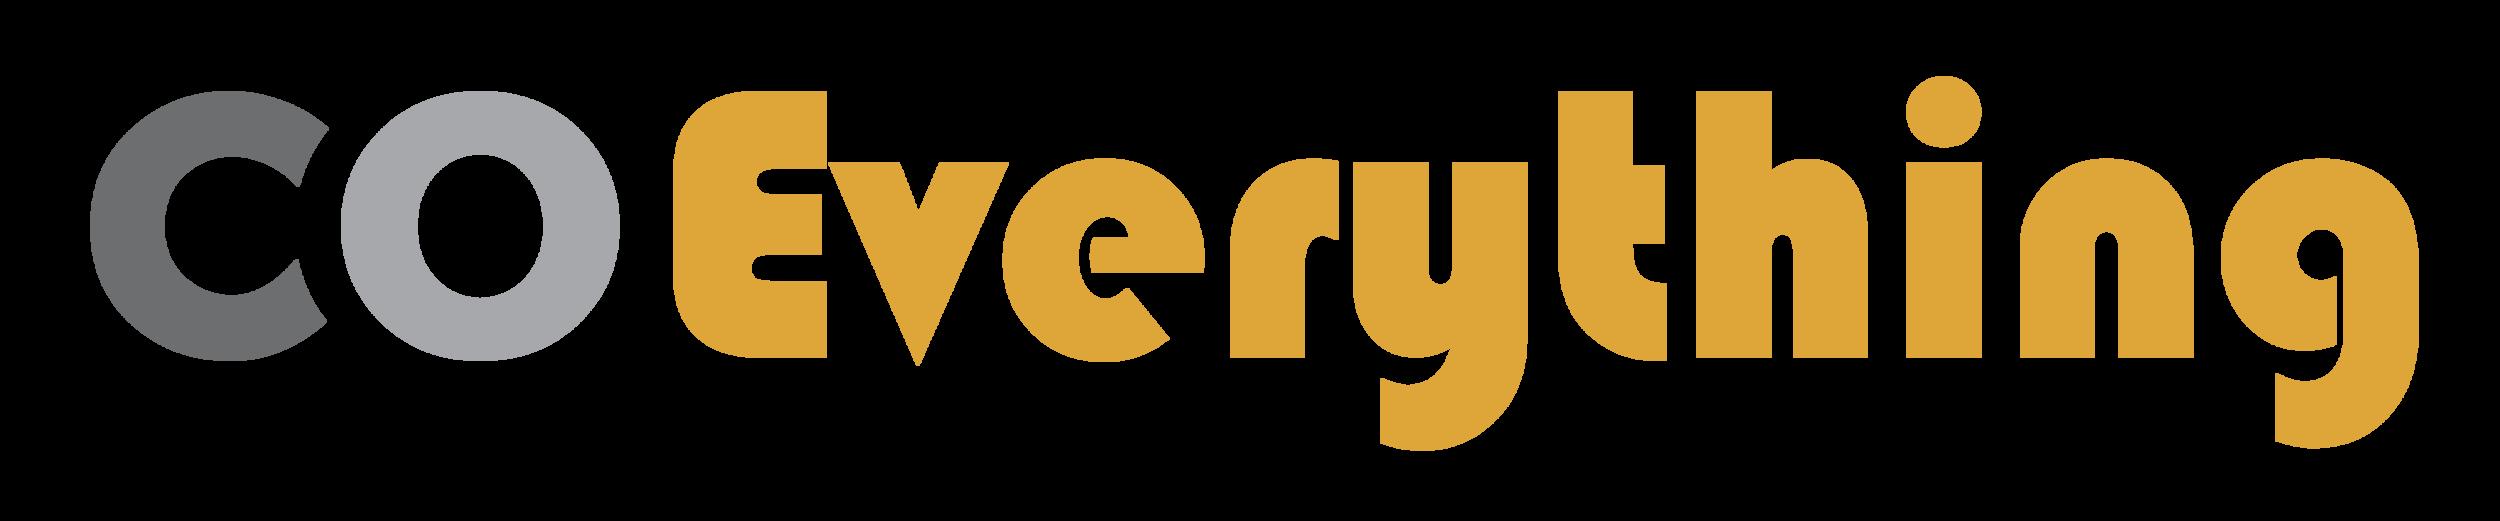 CoEverything Logo .png